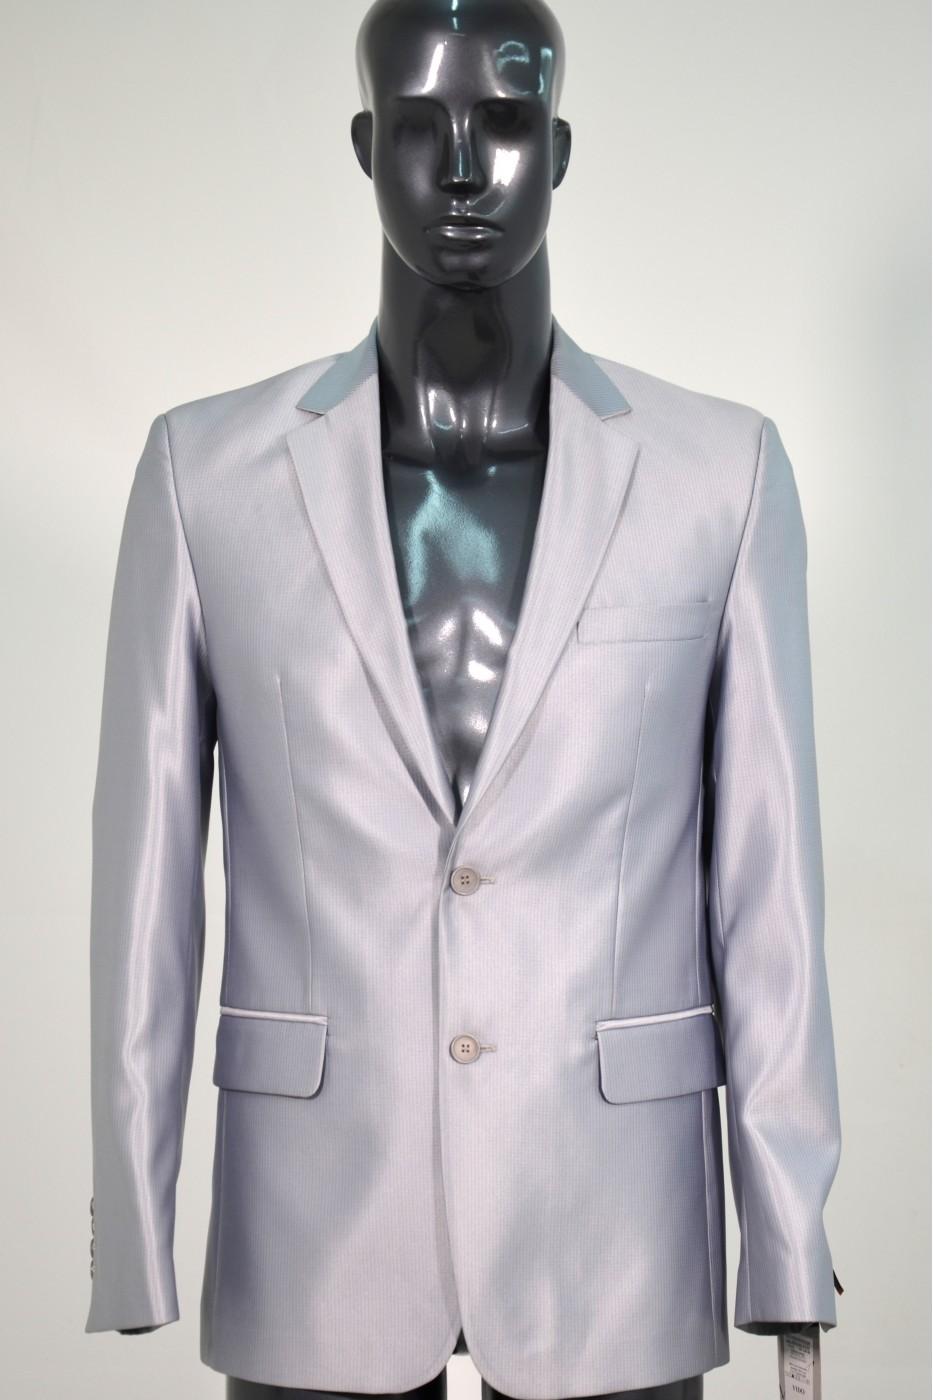 Cерый мужской костюм VIDO БРУКЛИН